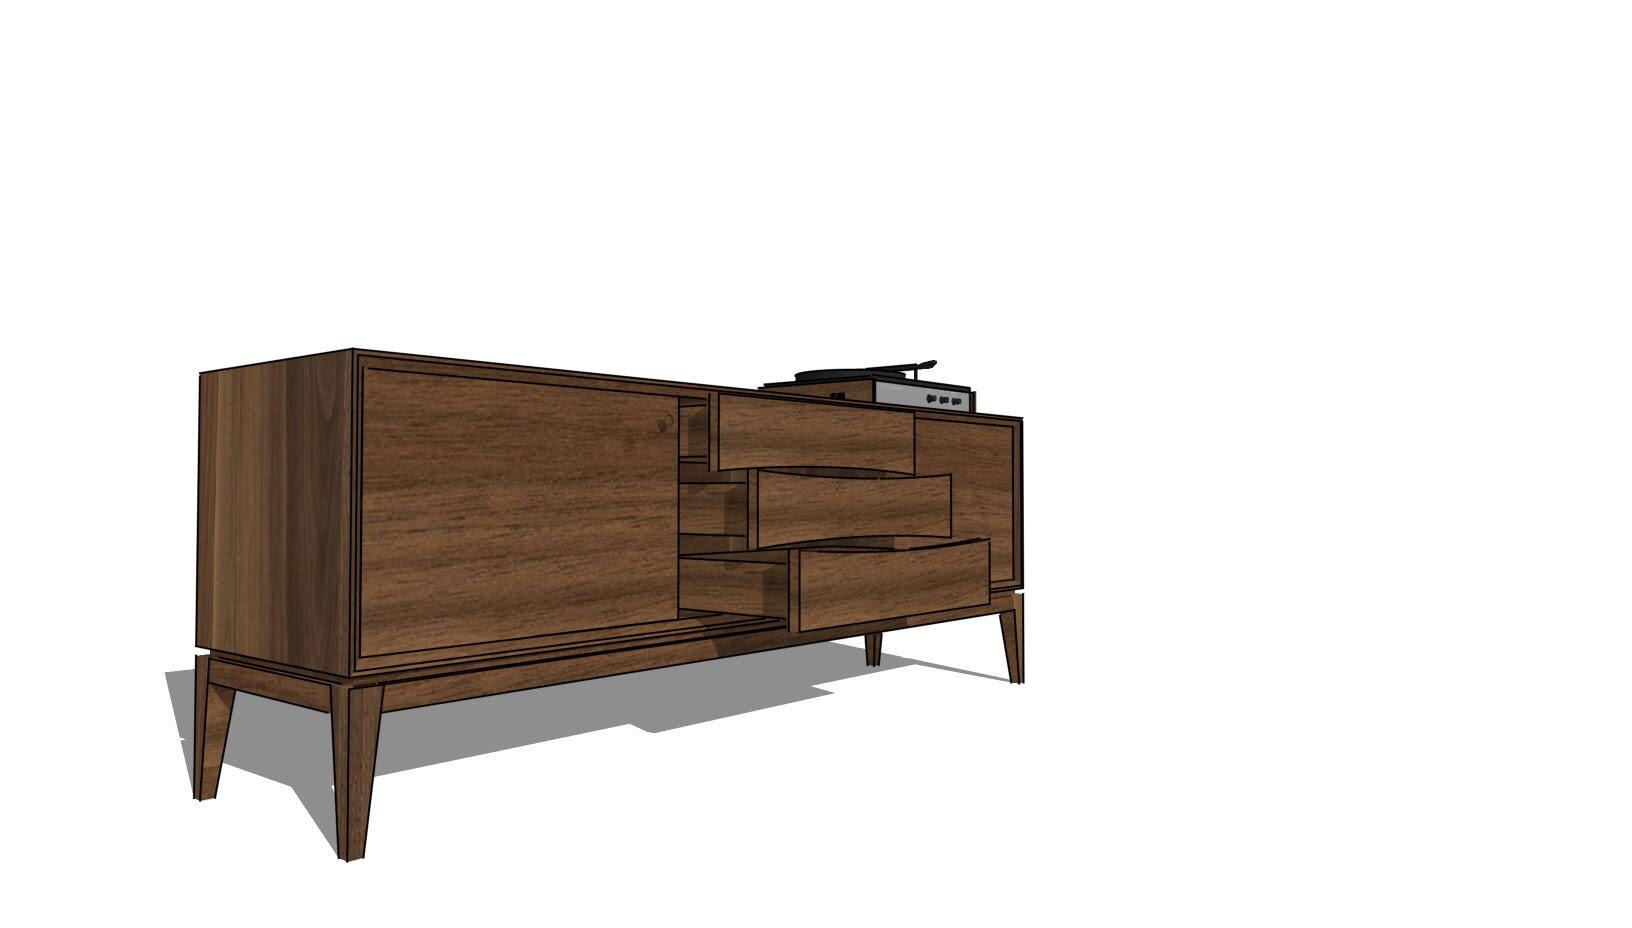 Alamo Design Co Tampa FL Custom Furniture Charity Raffle Record Console Open Drawers.jpg